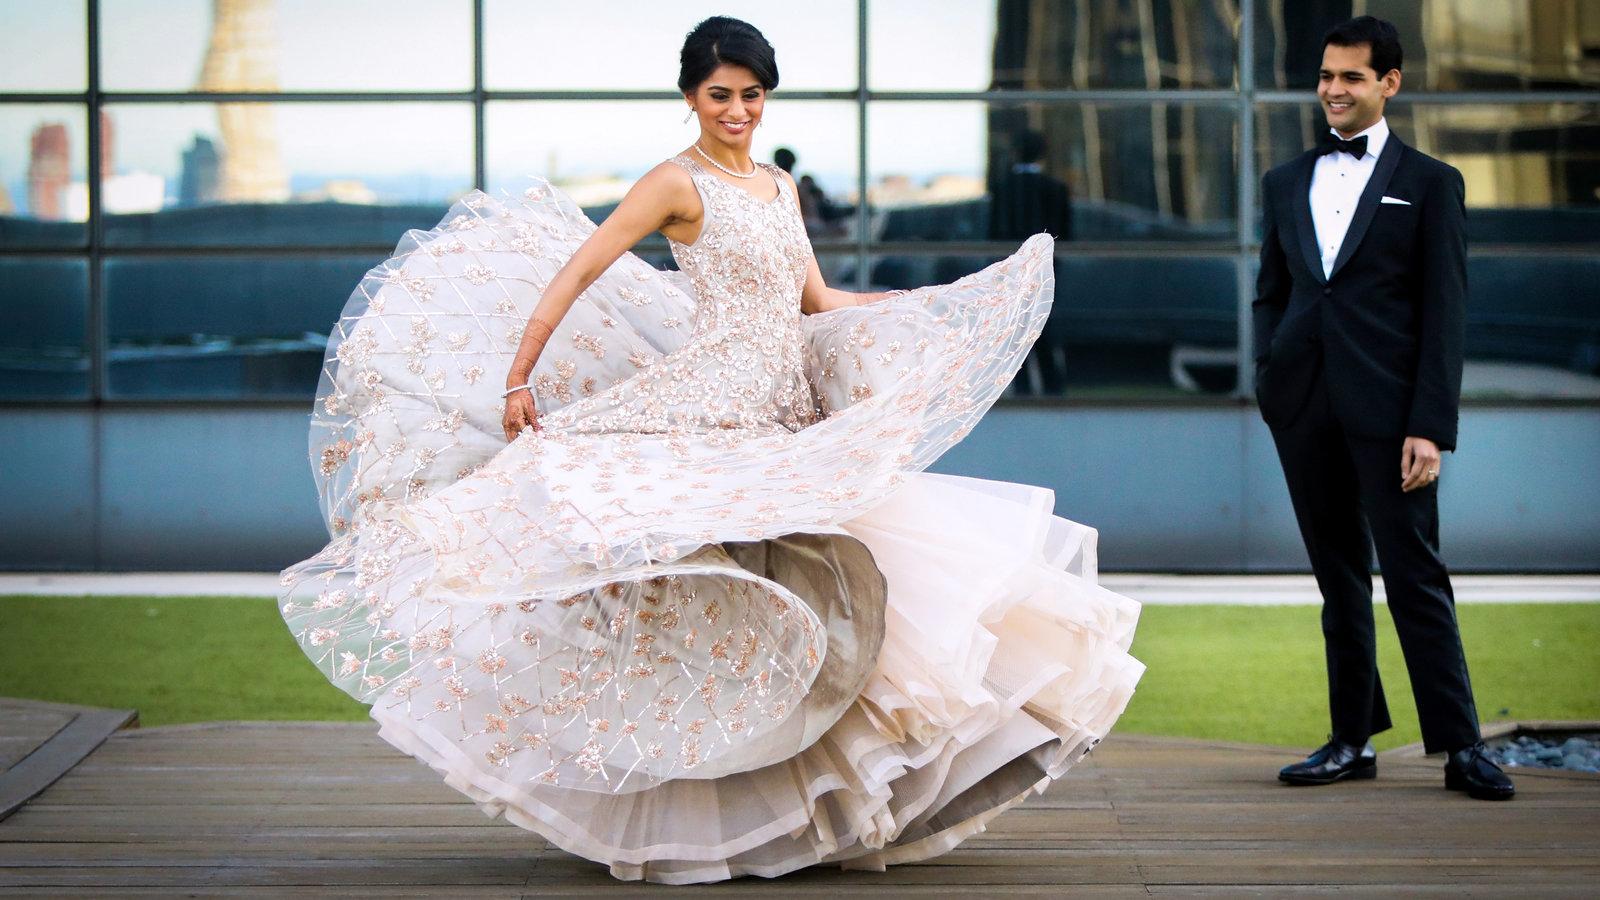 Dresses Our Brides Have Worn